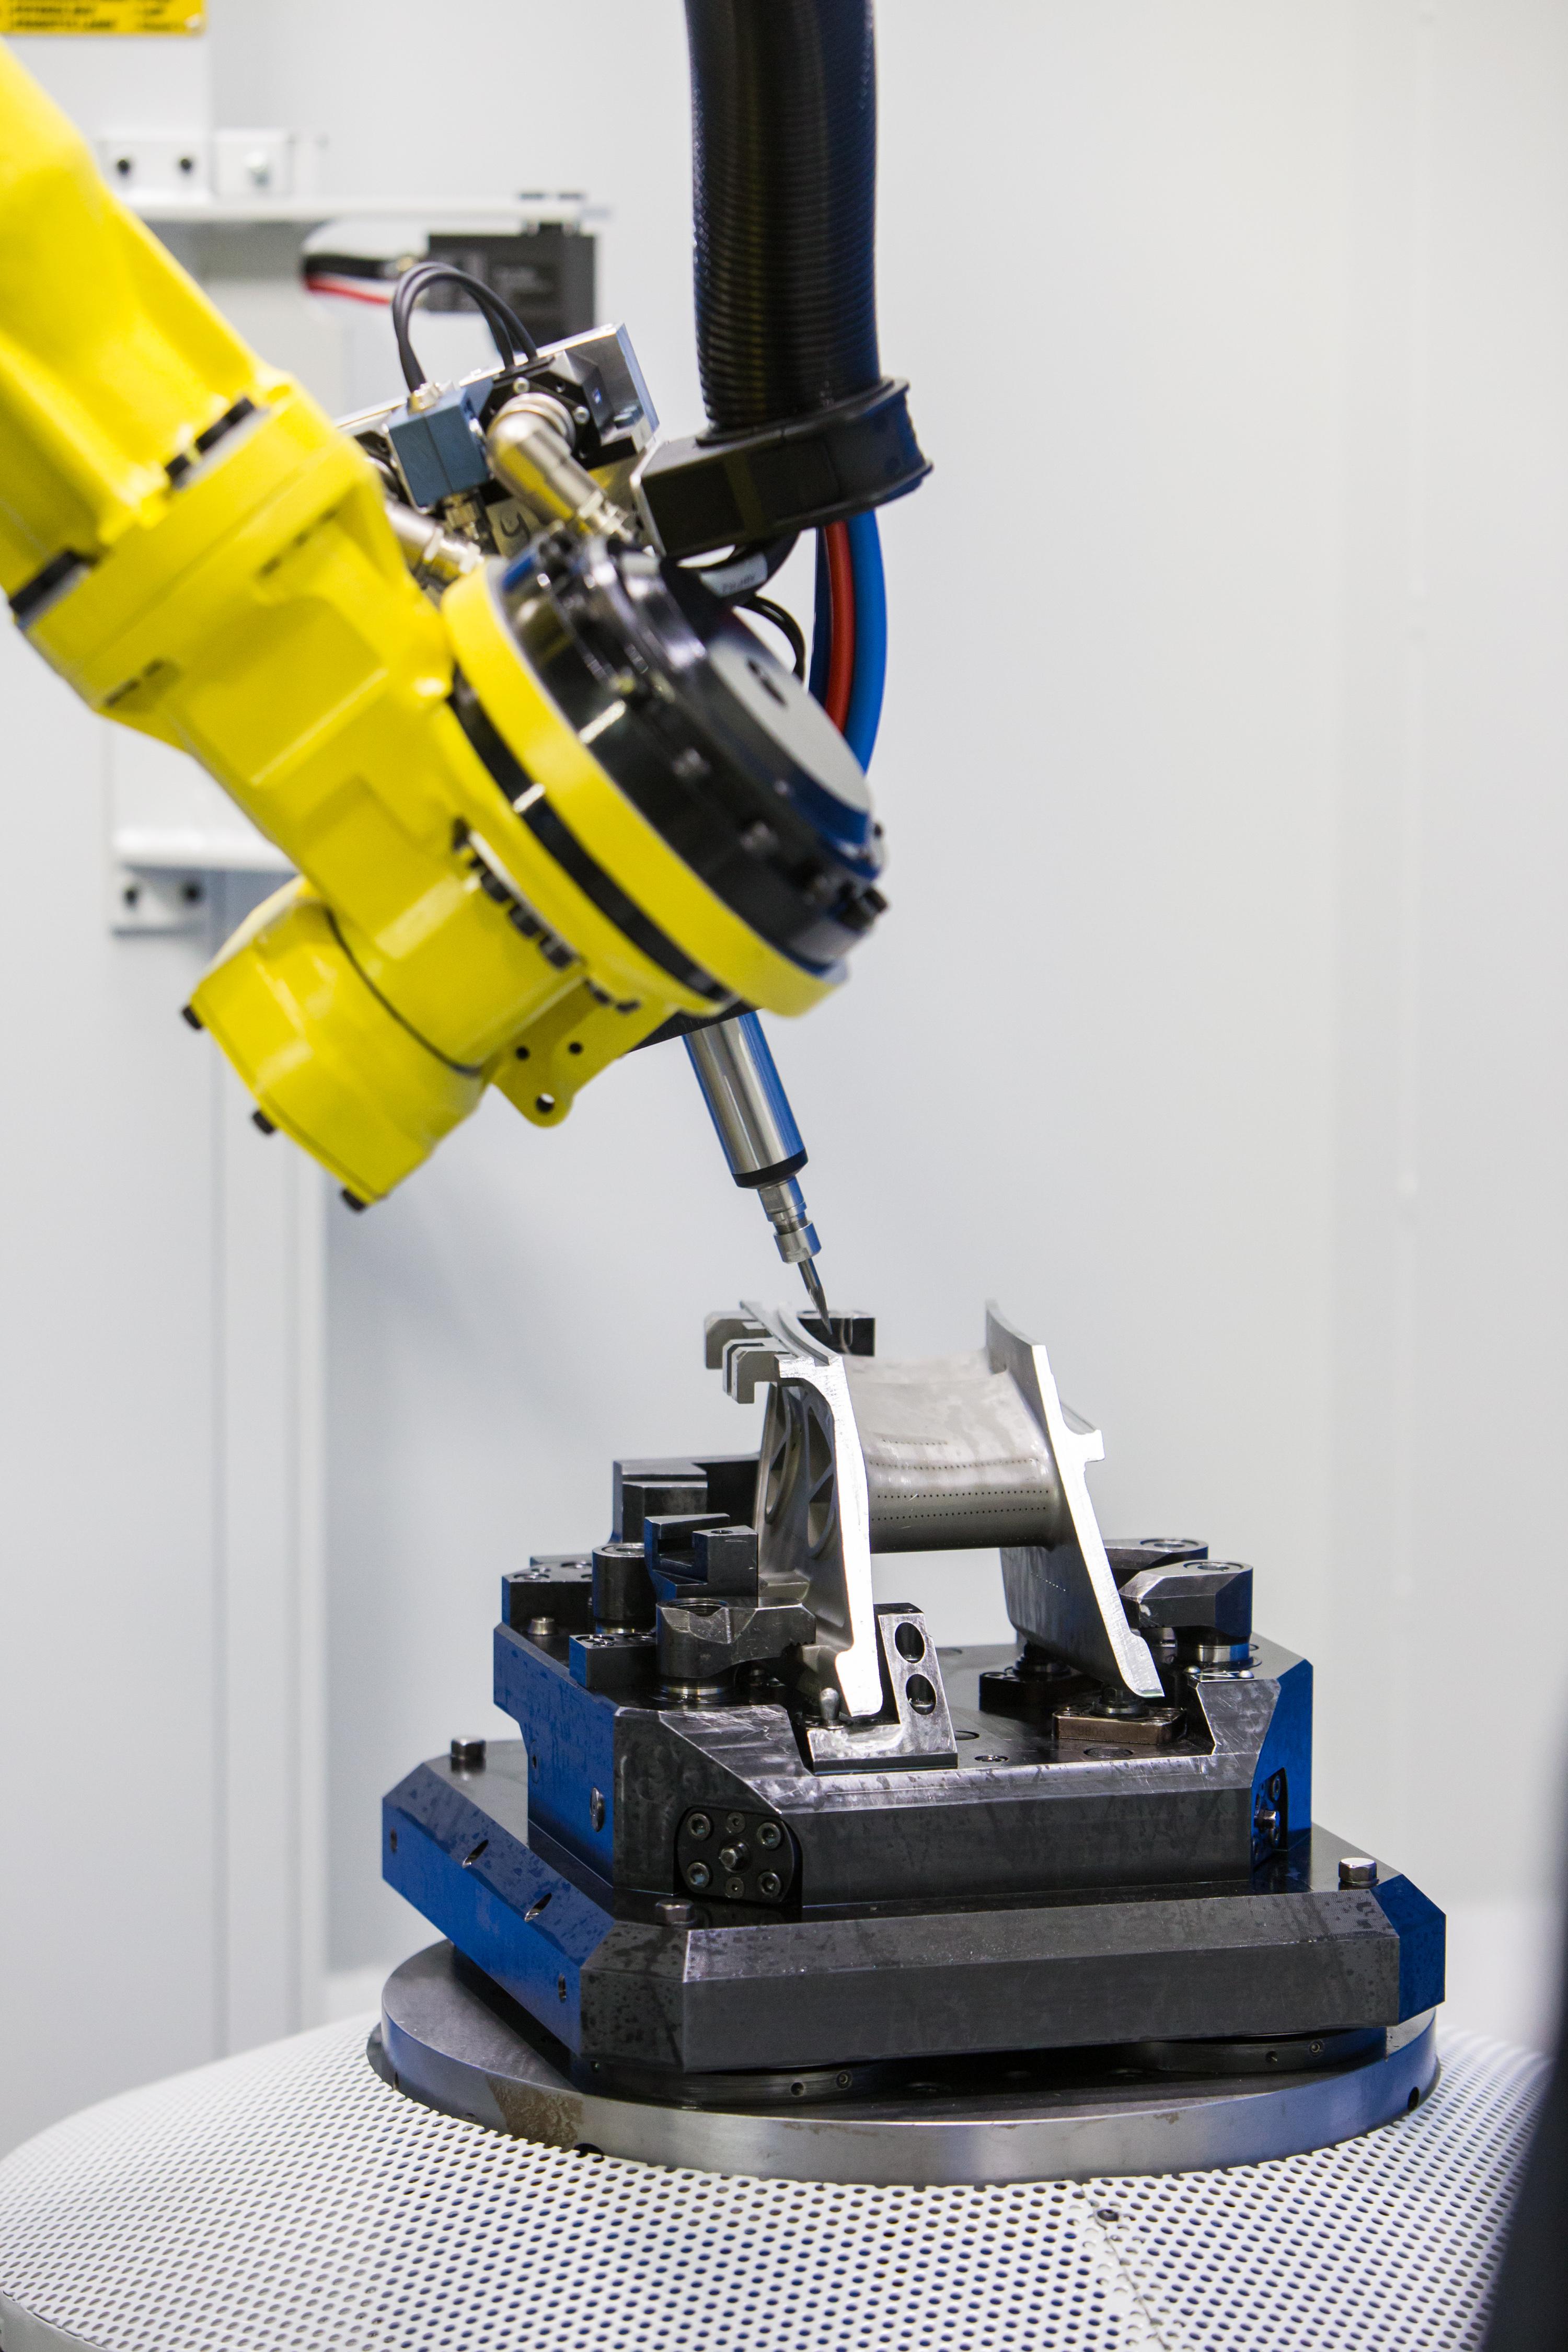 GE Oil & Gas Adds 3D Printing Line at Talamona Plant 3Printr